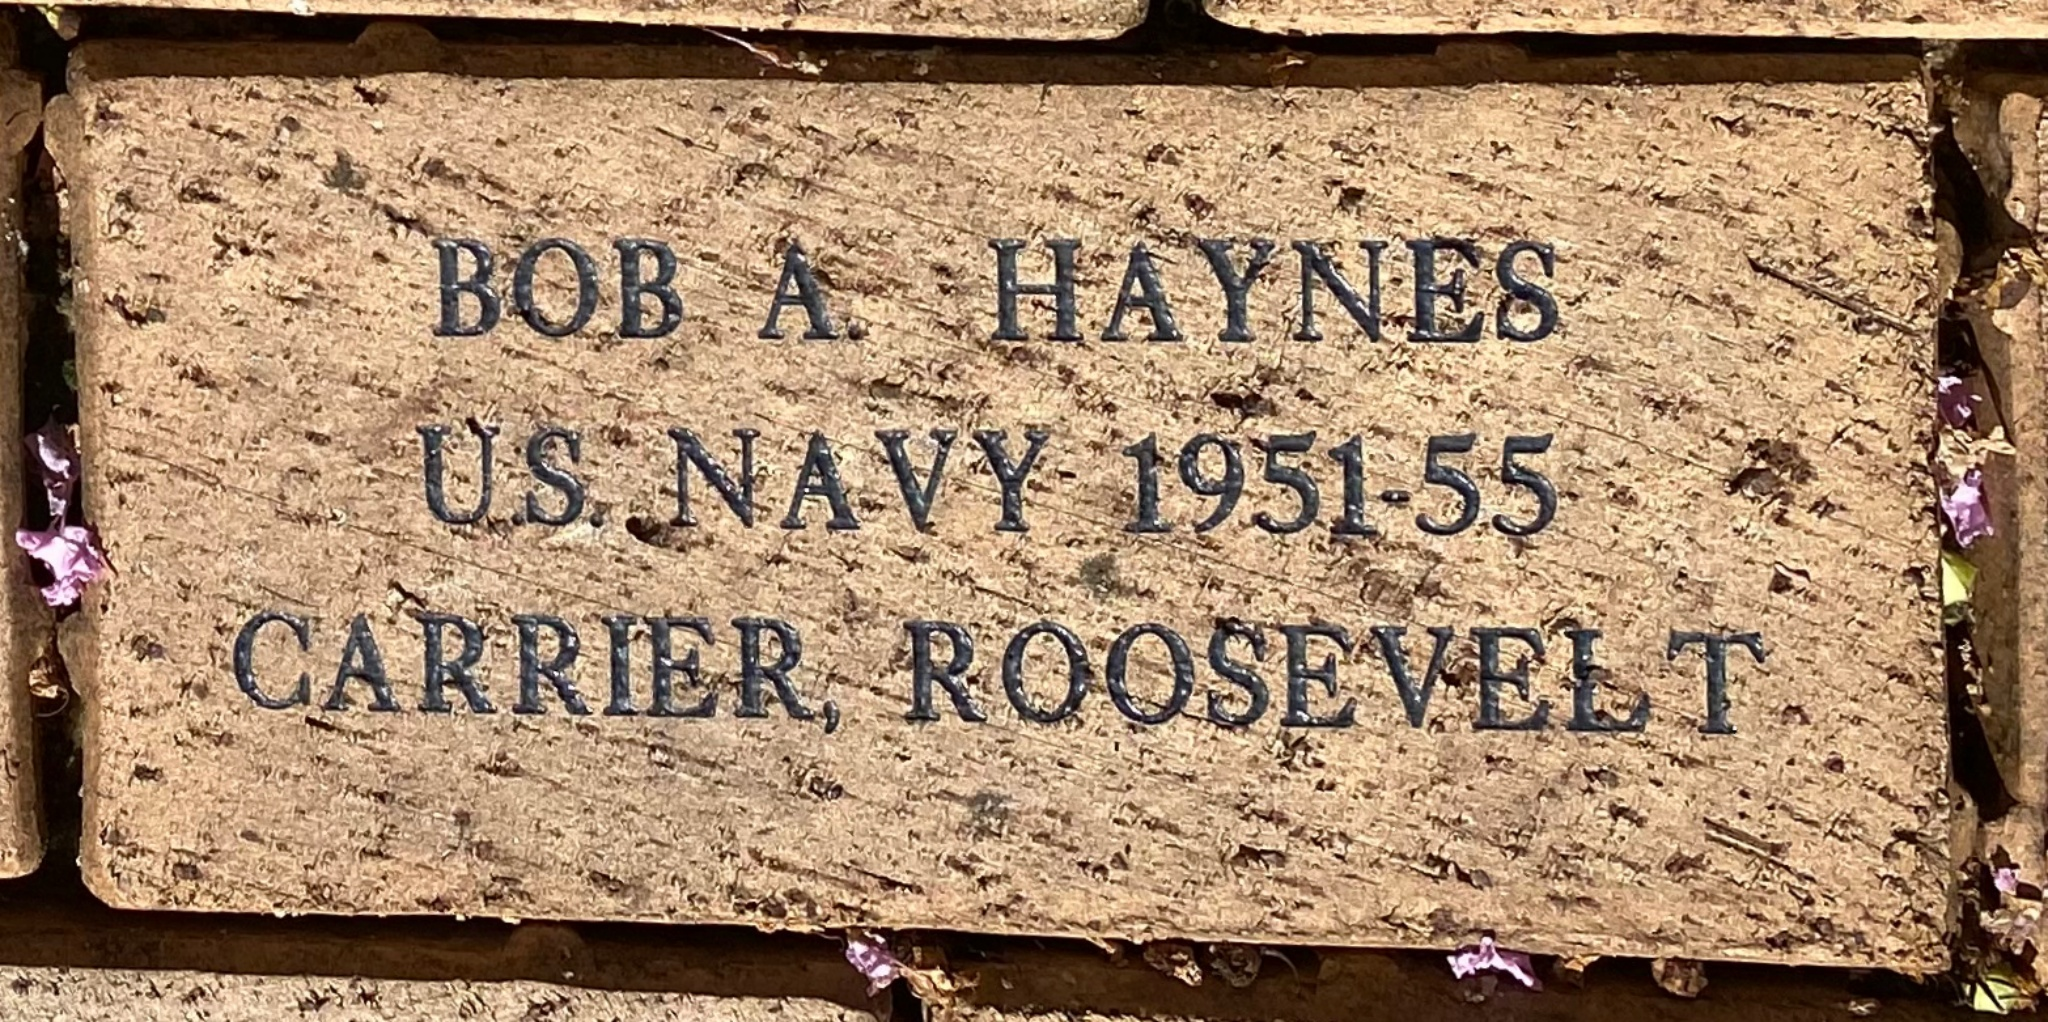 BOB A. HAYNES U.S. NAVY 1951-55 CARRIER, ROOSEVELT